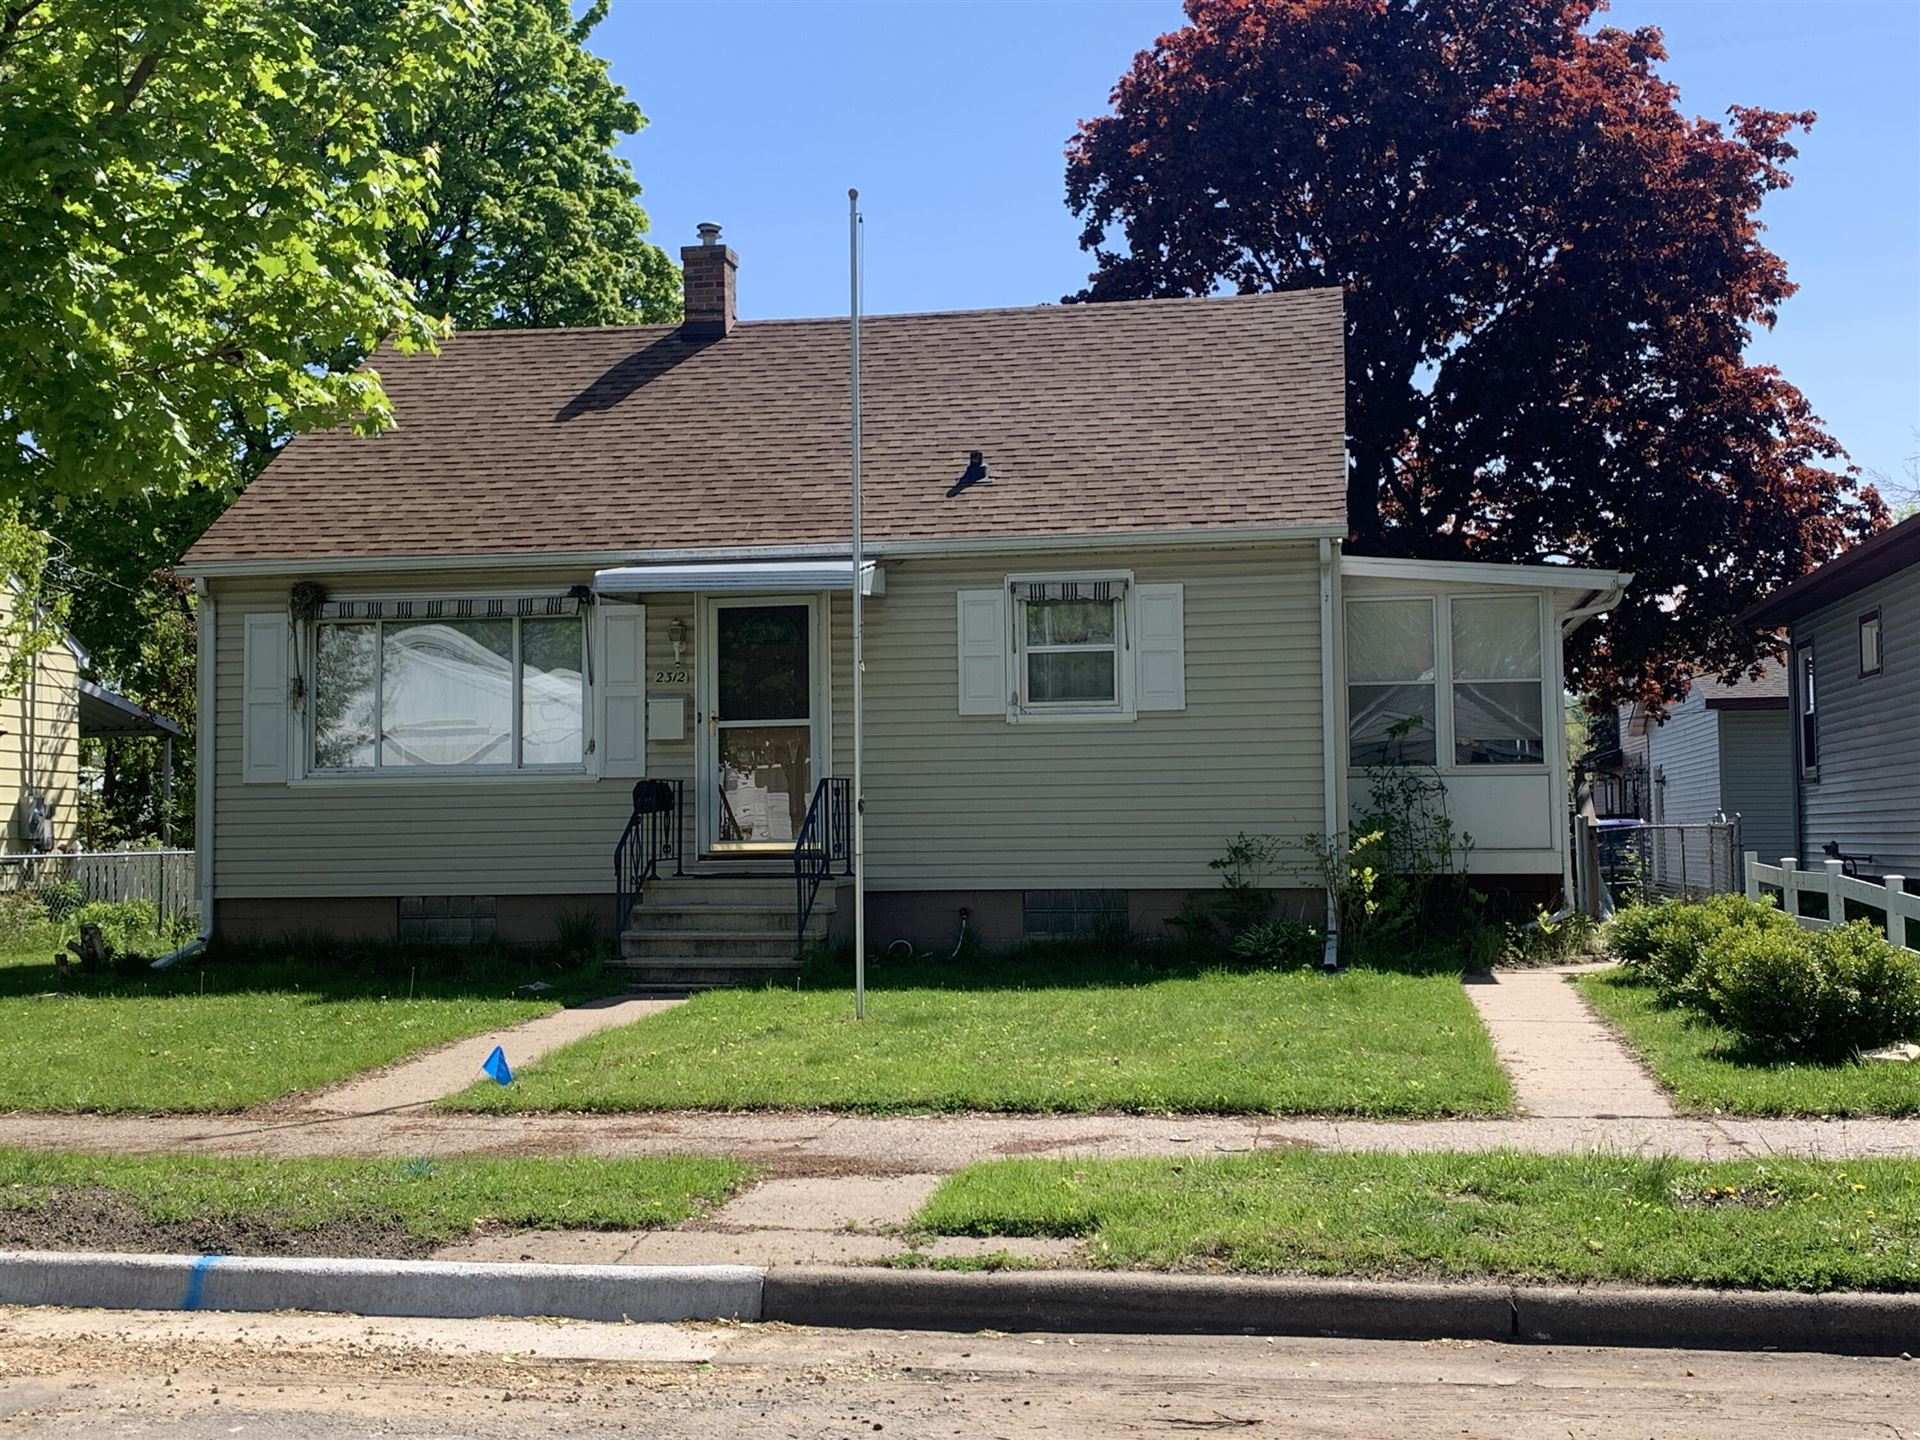 2312 Onalaska Ave, La Crosse, WI 54603 - MLS#: 1741567